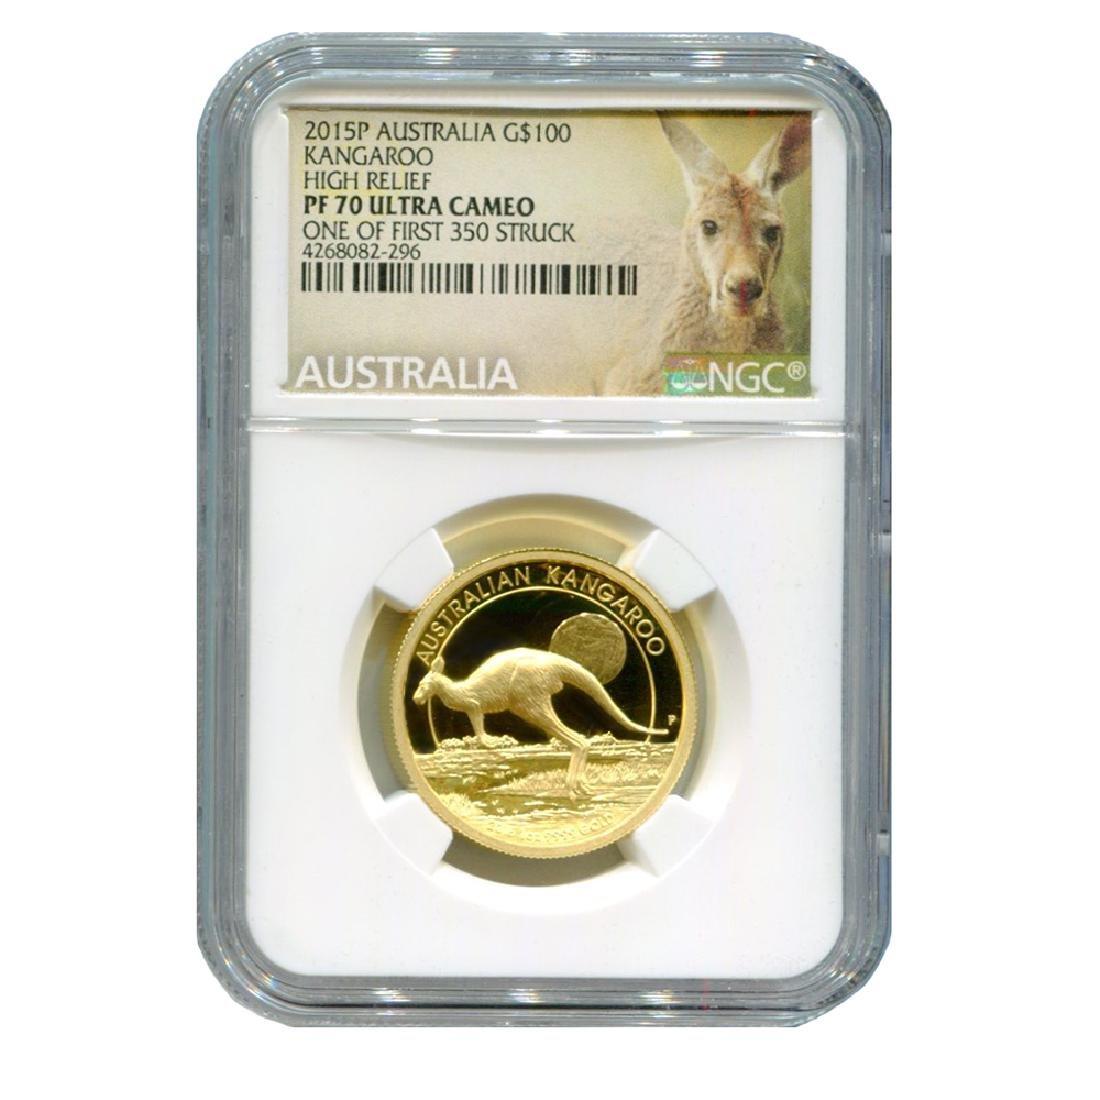 Certified Australian 1 oz Gold Kangaroo 2015 PF70 Ultra